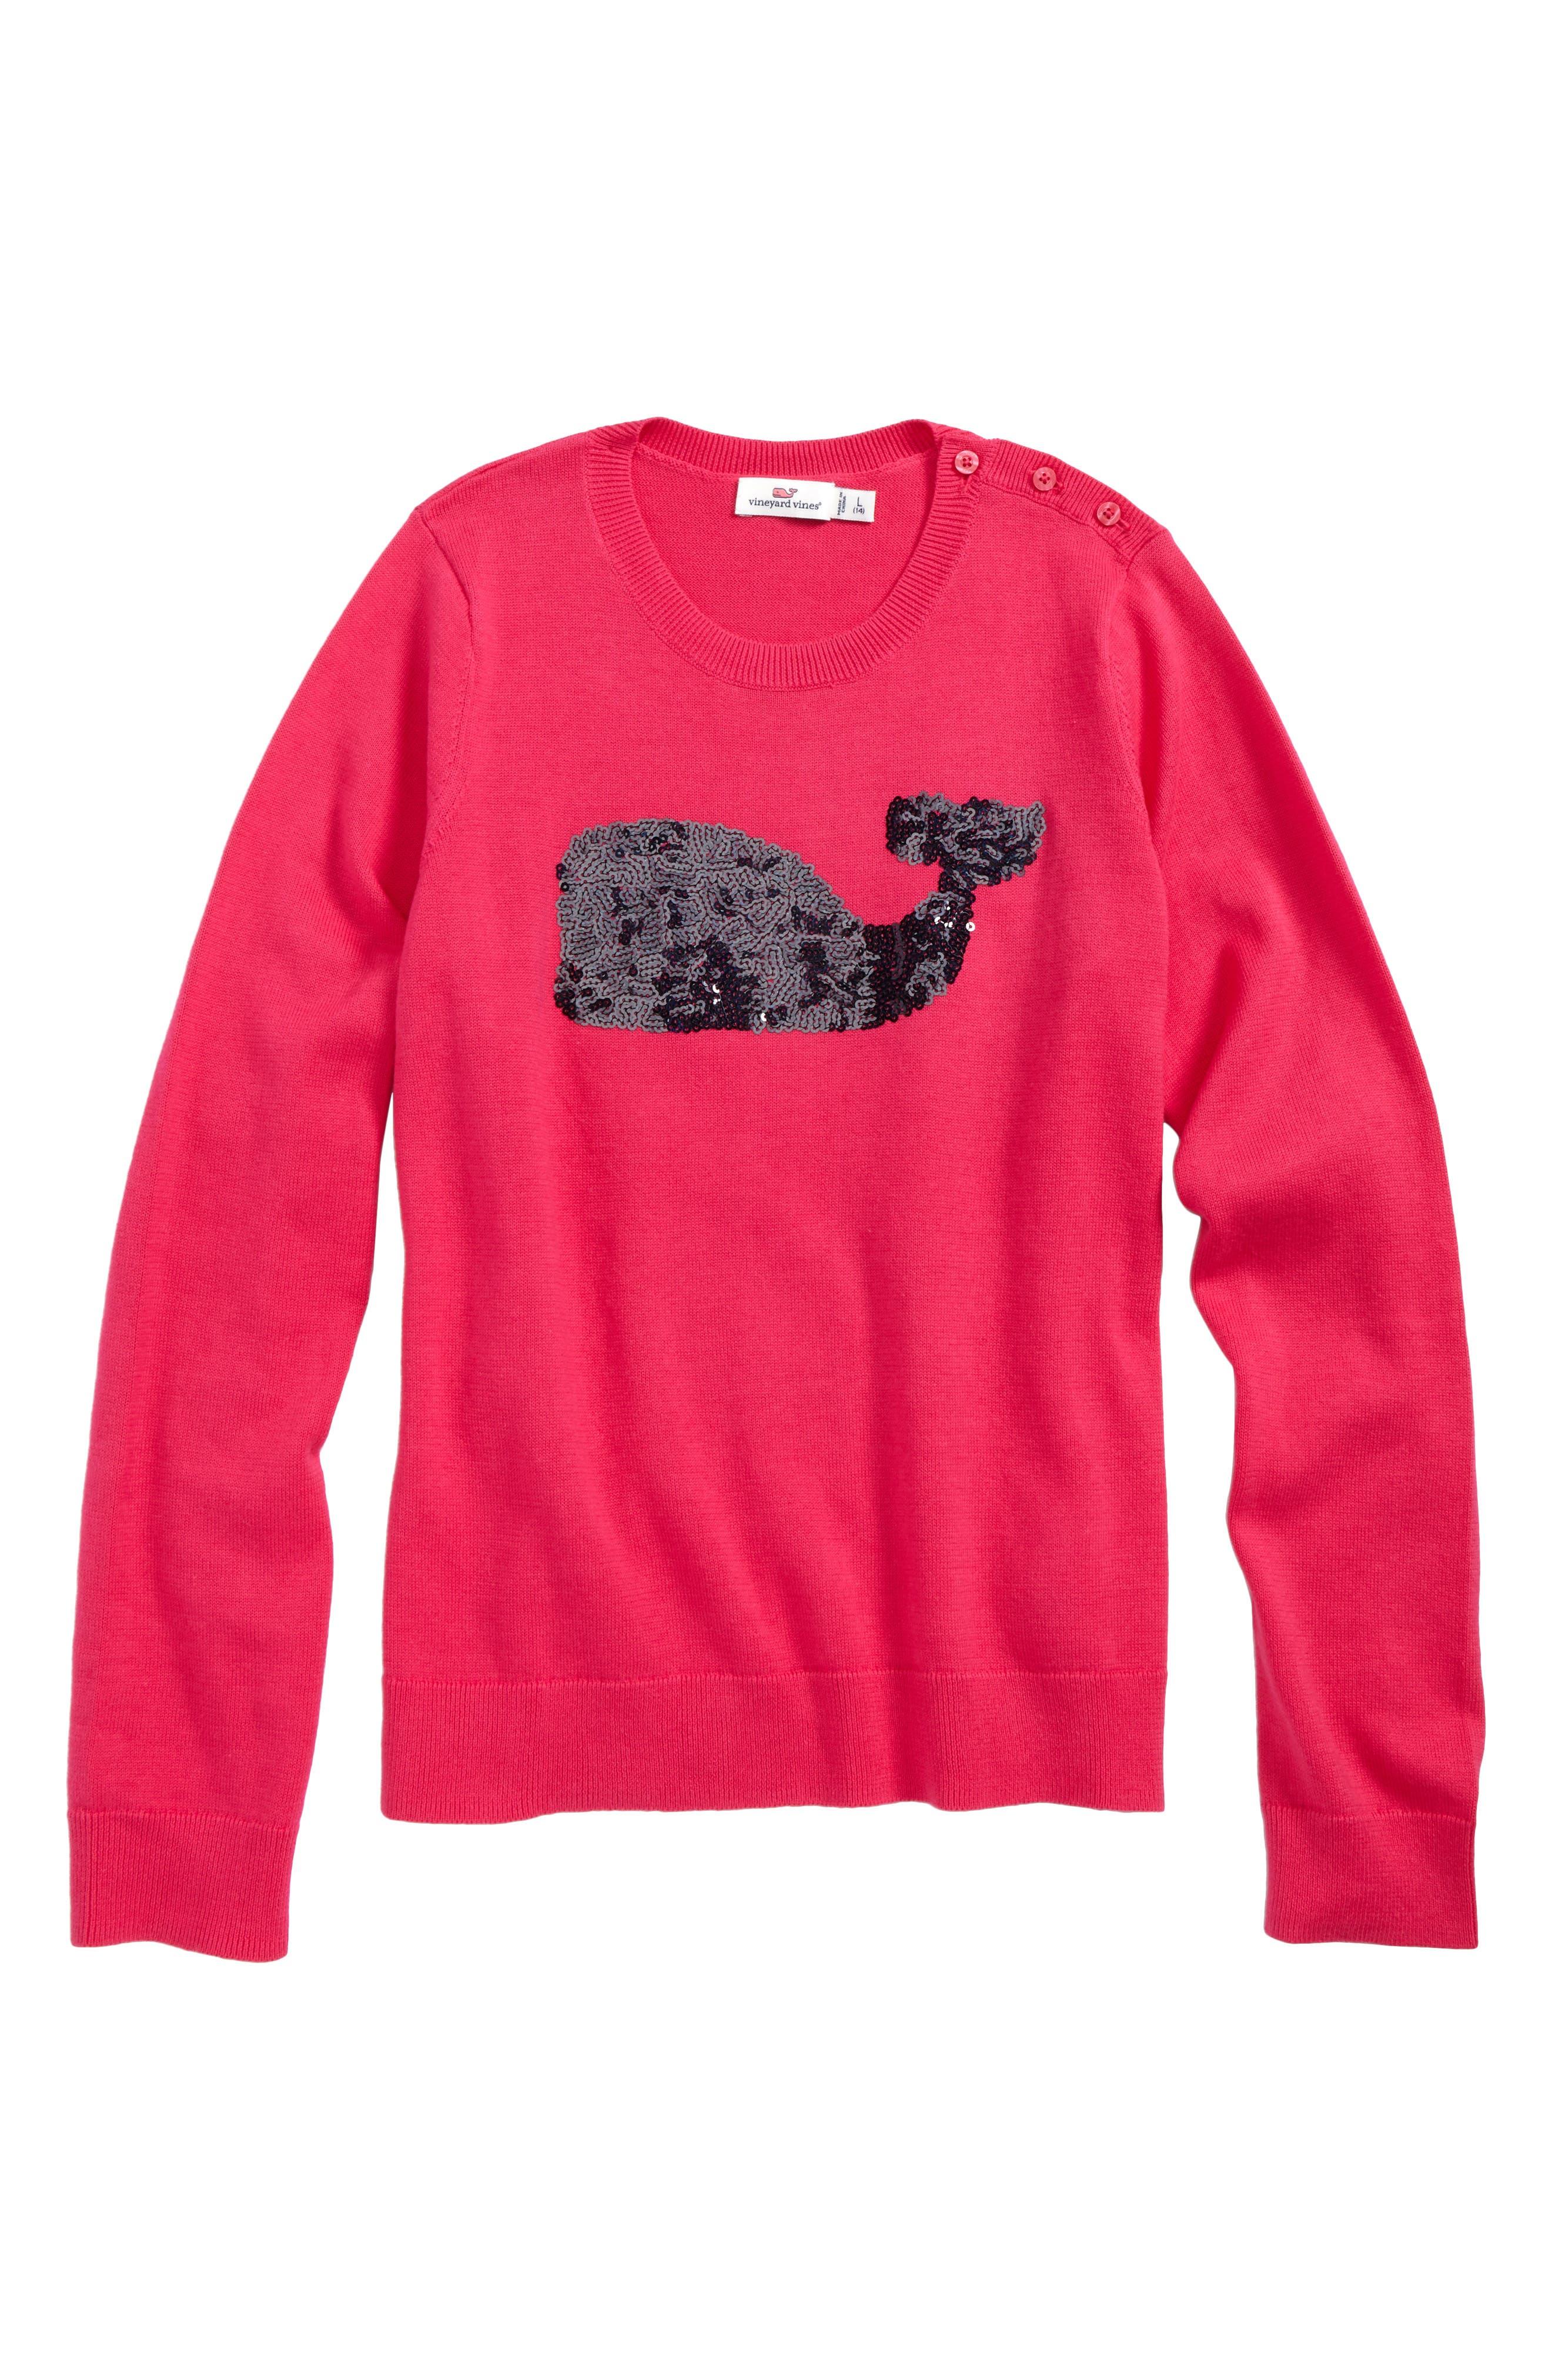 VINEYARD VINES,                             Sequin Whale Sweater,                             Main thumbnail 1, color,                             658